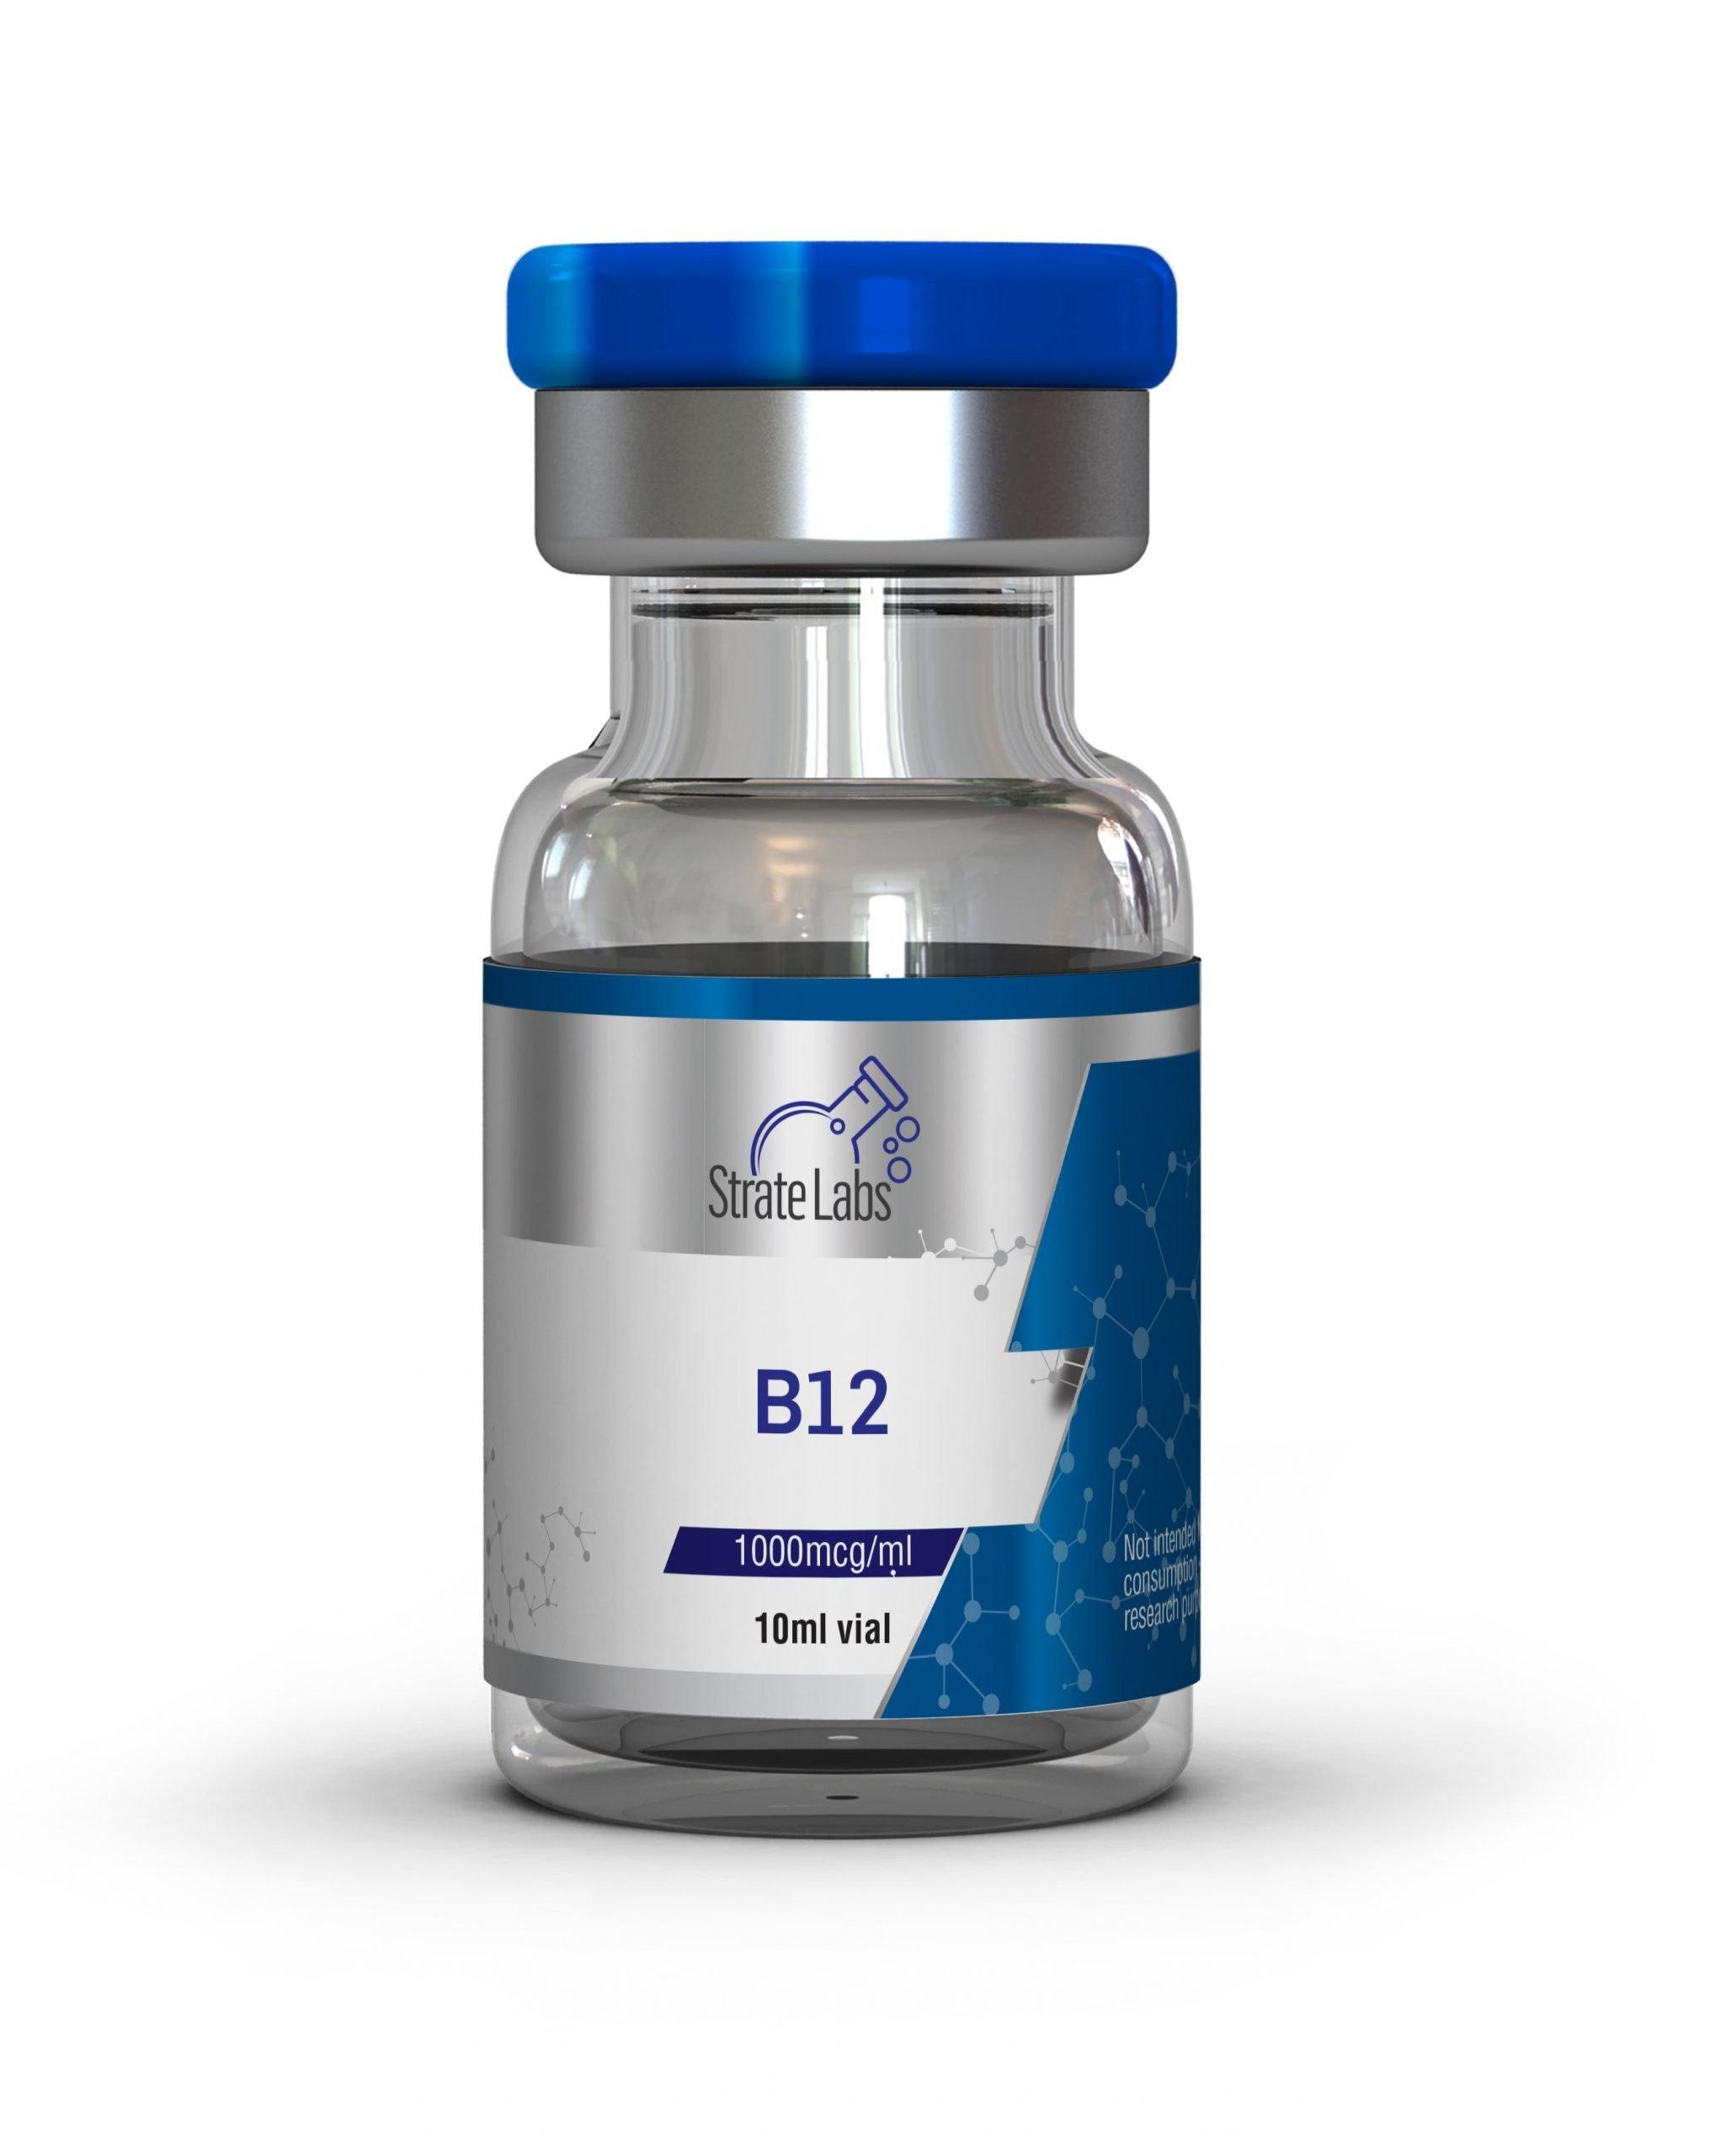 B12 | 1000mcg/ml - Strate Labs